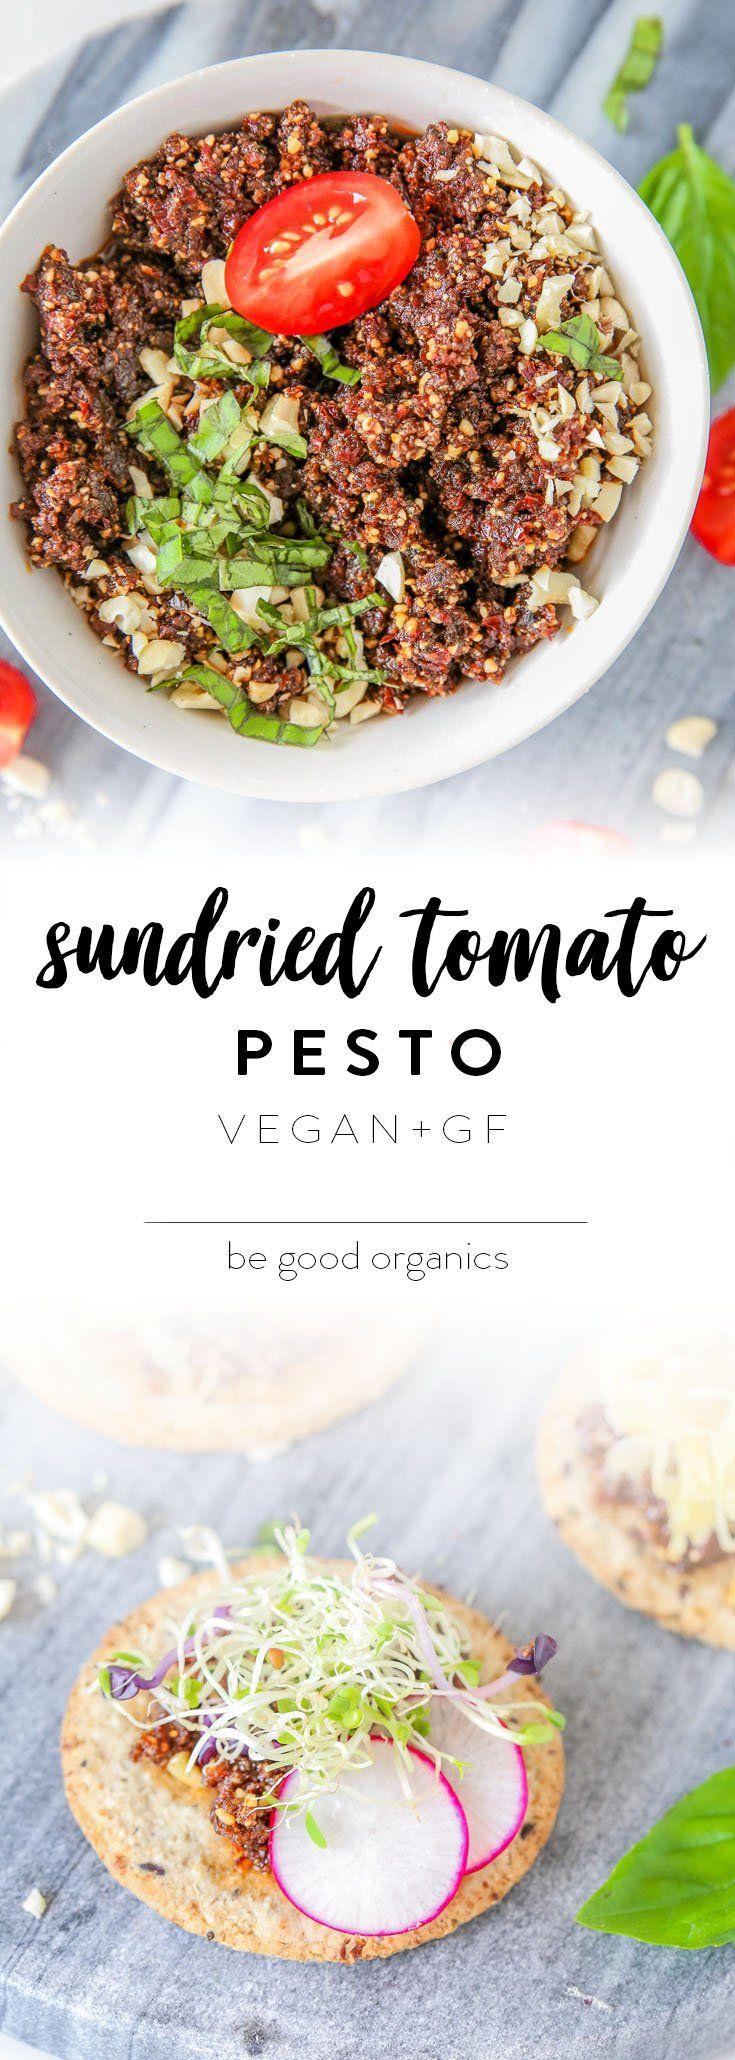 SUNDRIED TOMATO PESTO - vegan, plant based, easy, quick, 6 ingredients, gluten free, grain free, paleo, keto, ketogenic, low carb, sugar free, recipe, nutritionist, begoodorganics, buffyellen, Pinterest